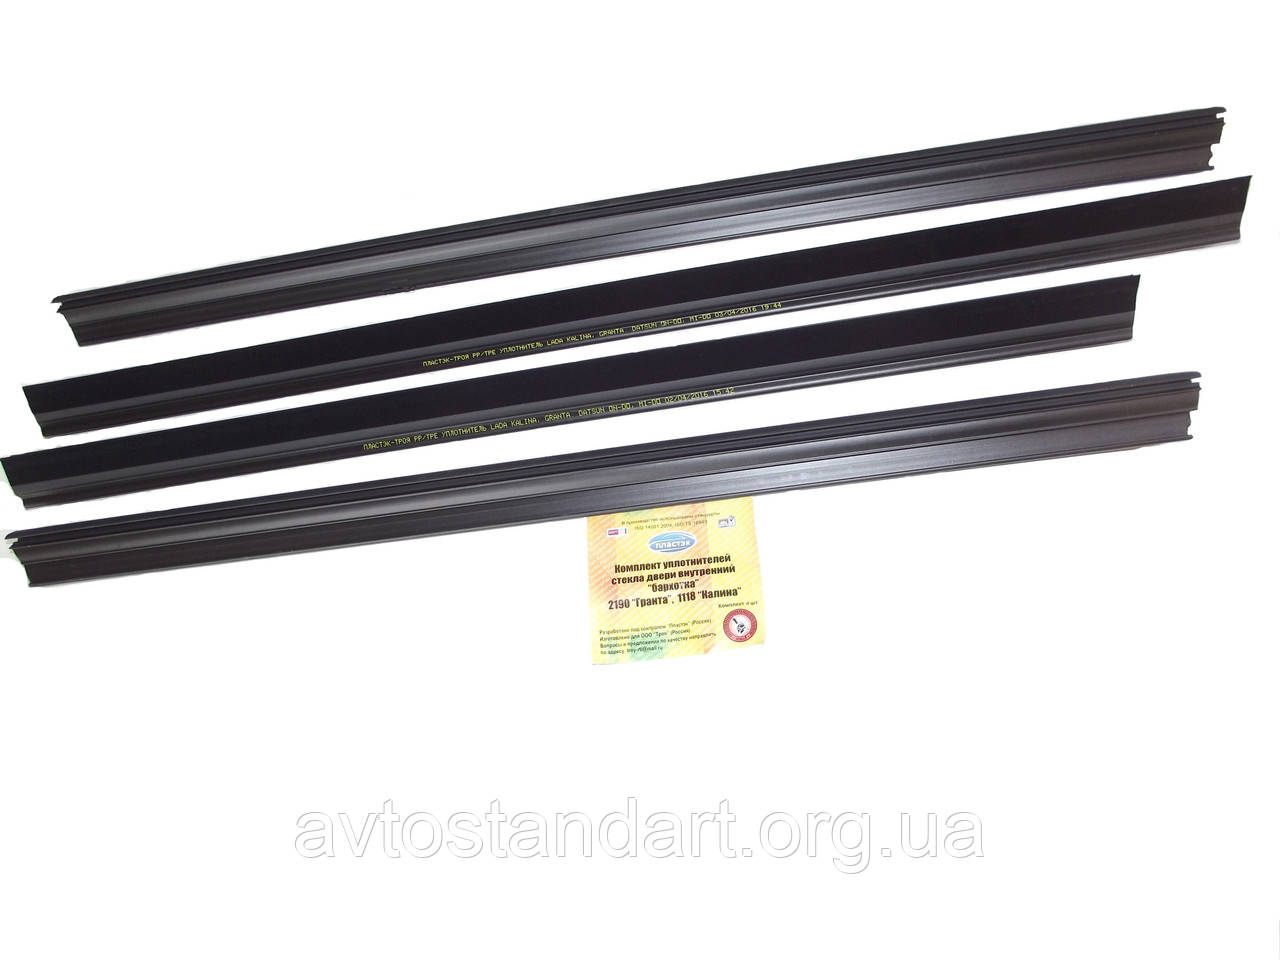 Уплотнители опускного стекла нижние внутренние ВАЗ 1118 БРТ